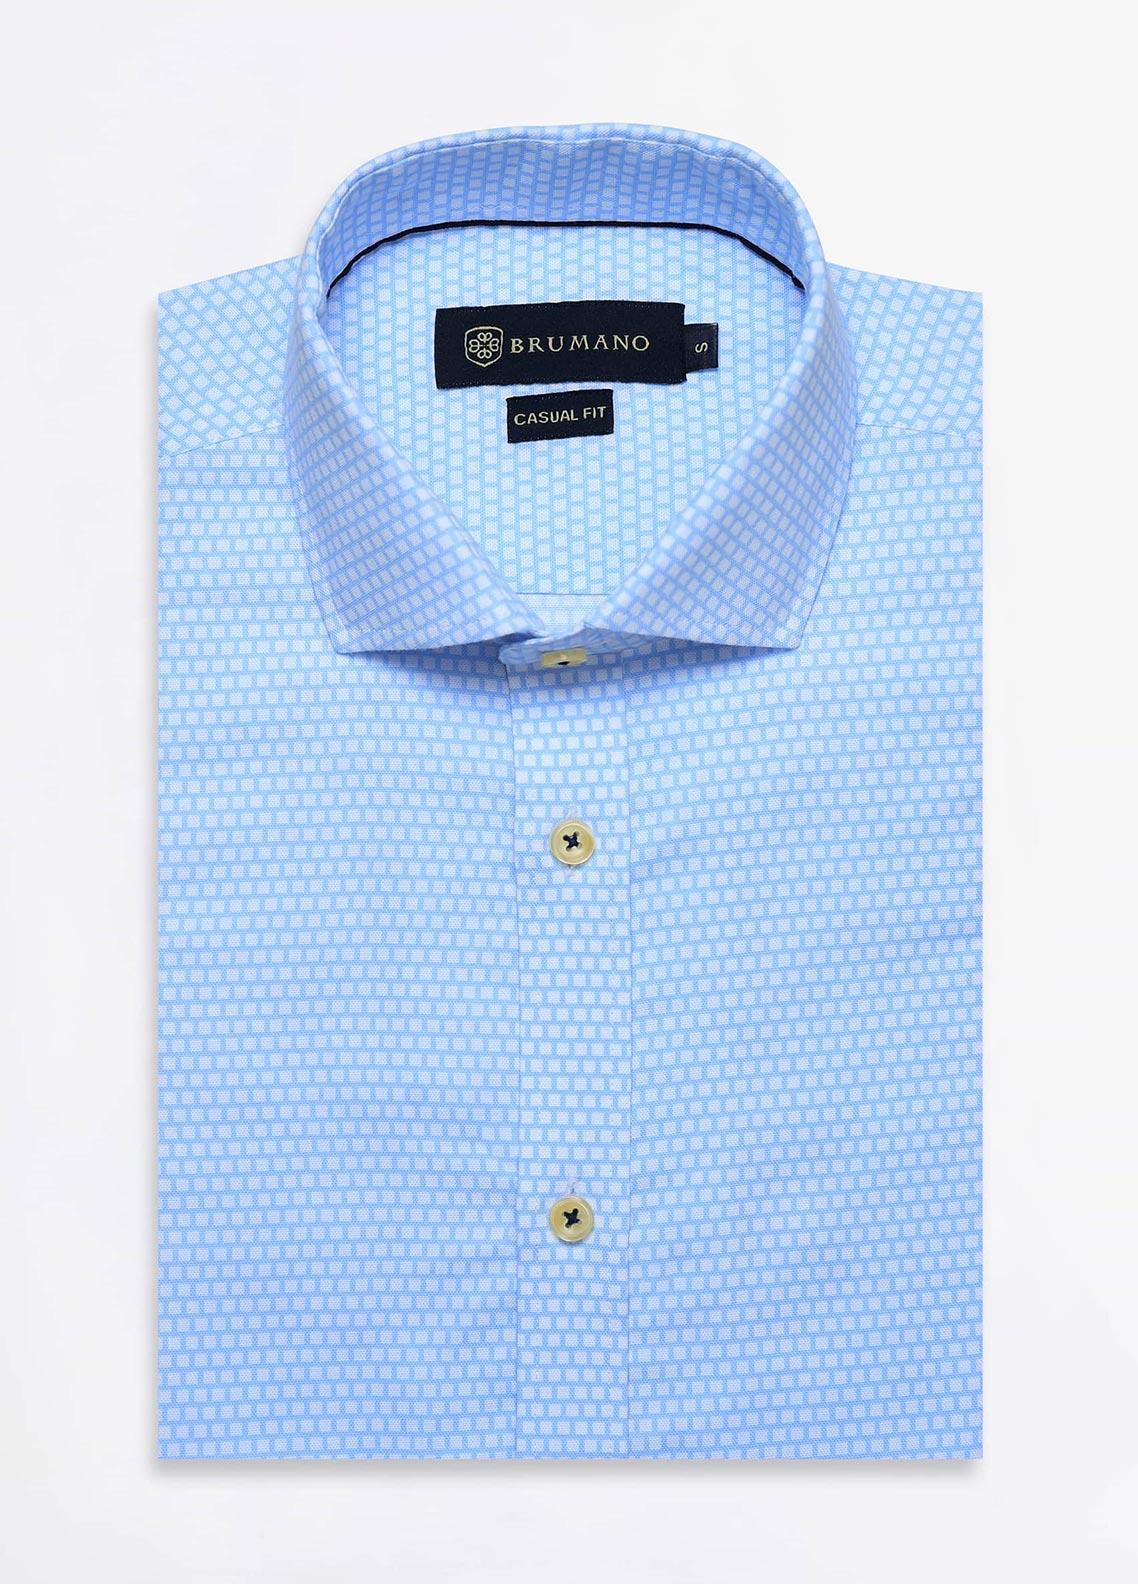 Brumano Cotton Formal Shirts for Men -  BRM-940